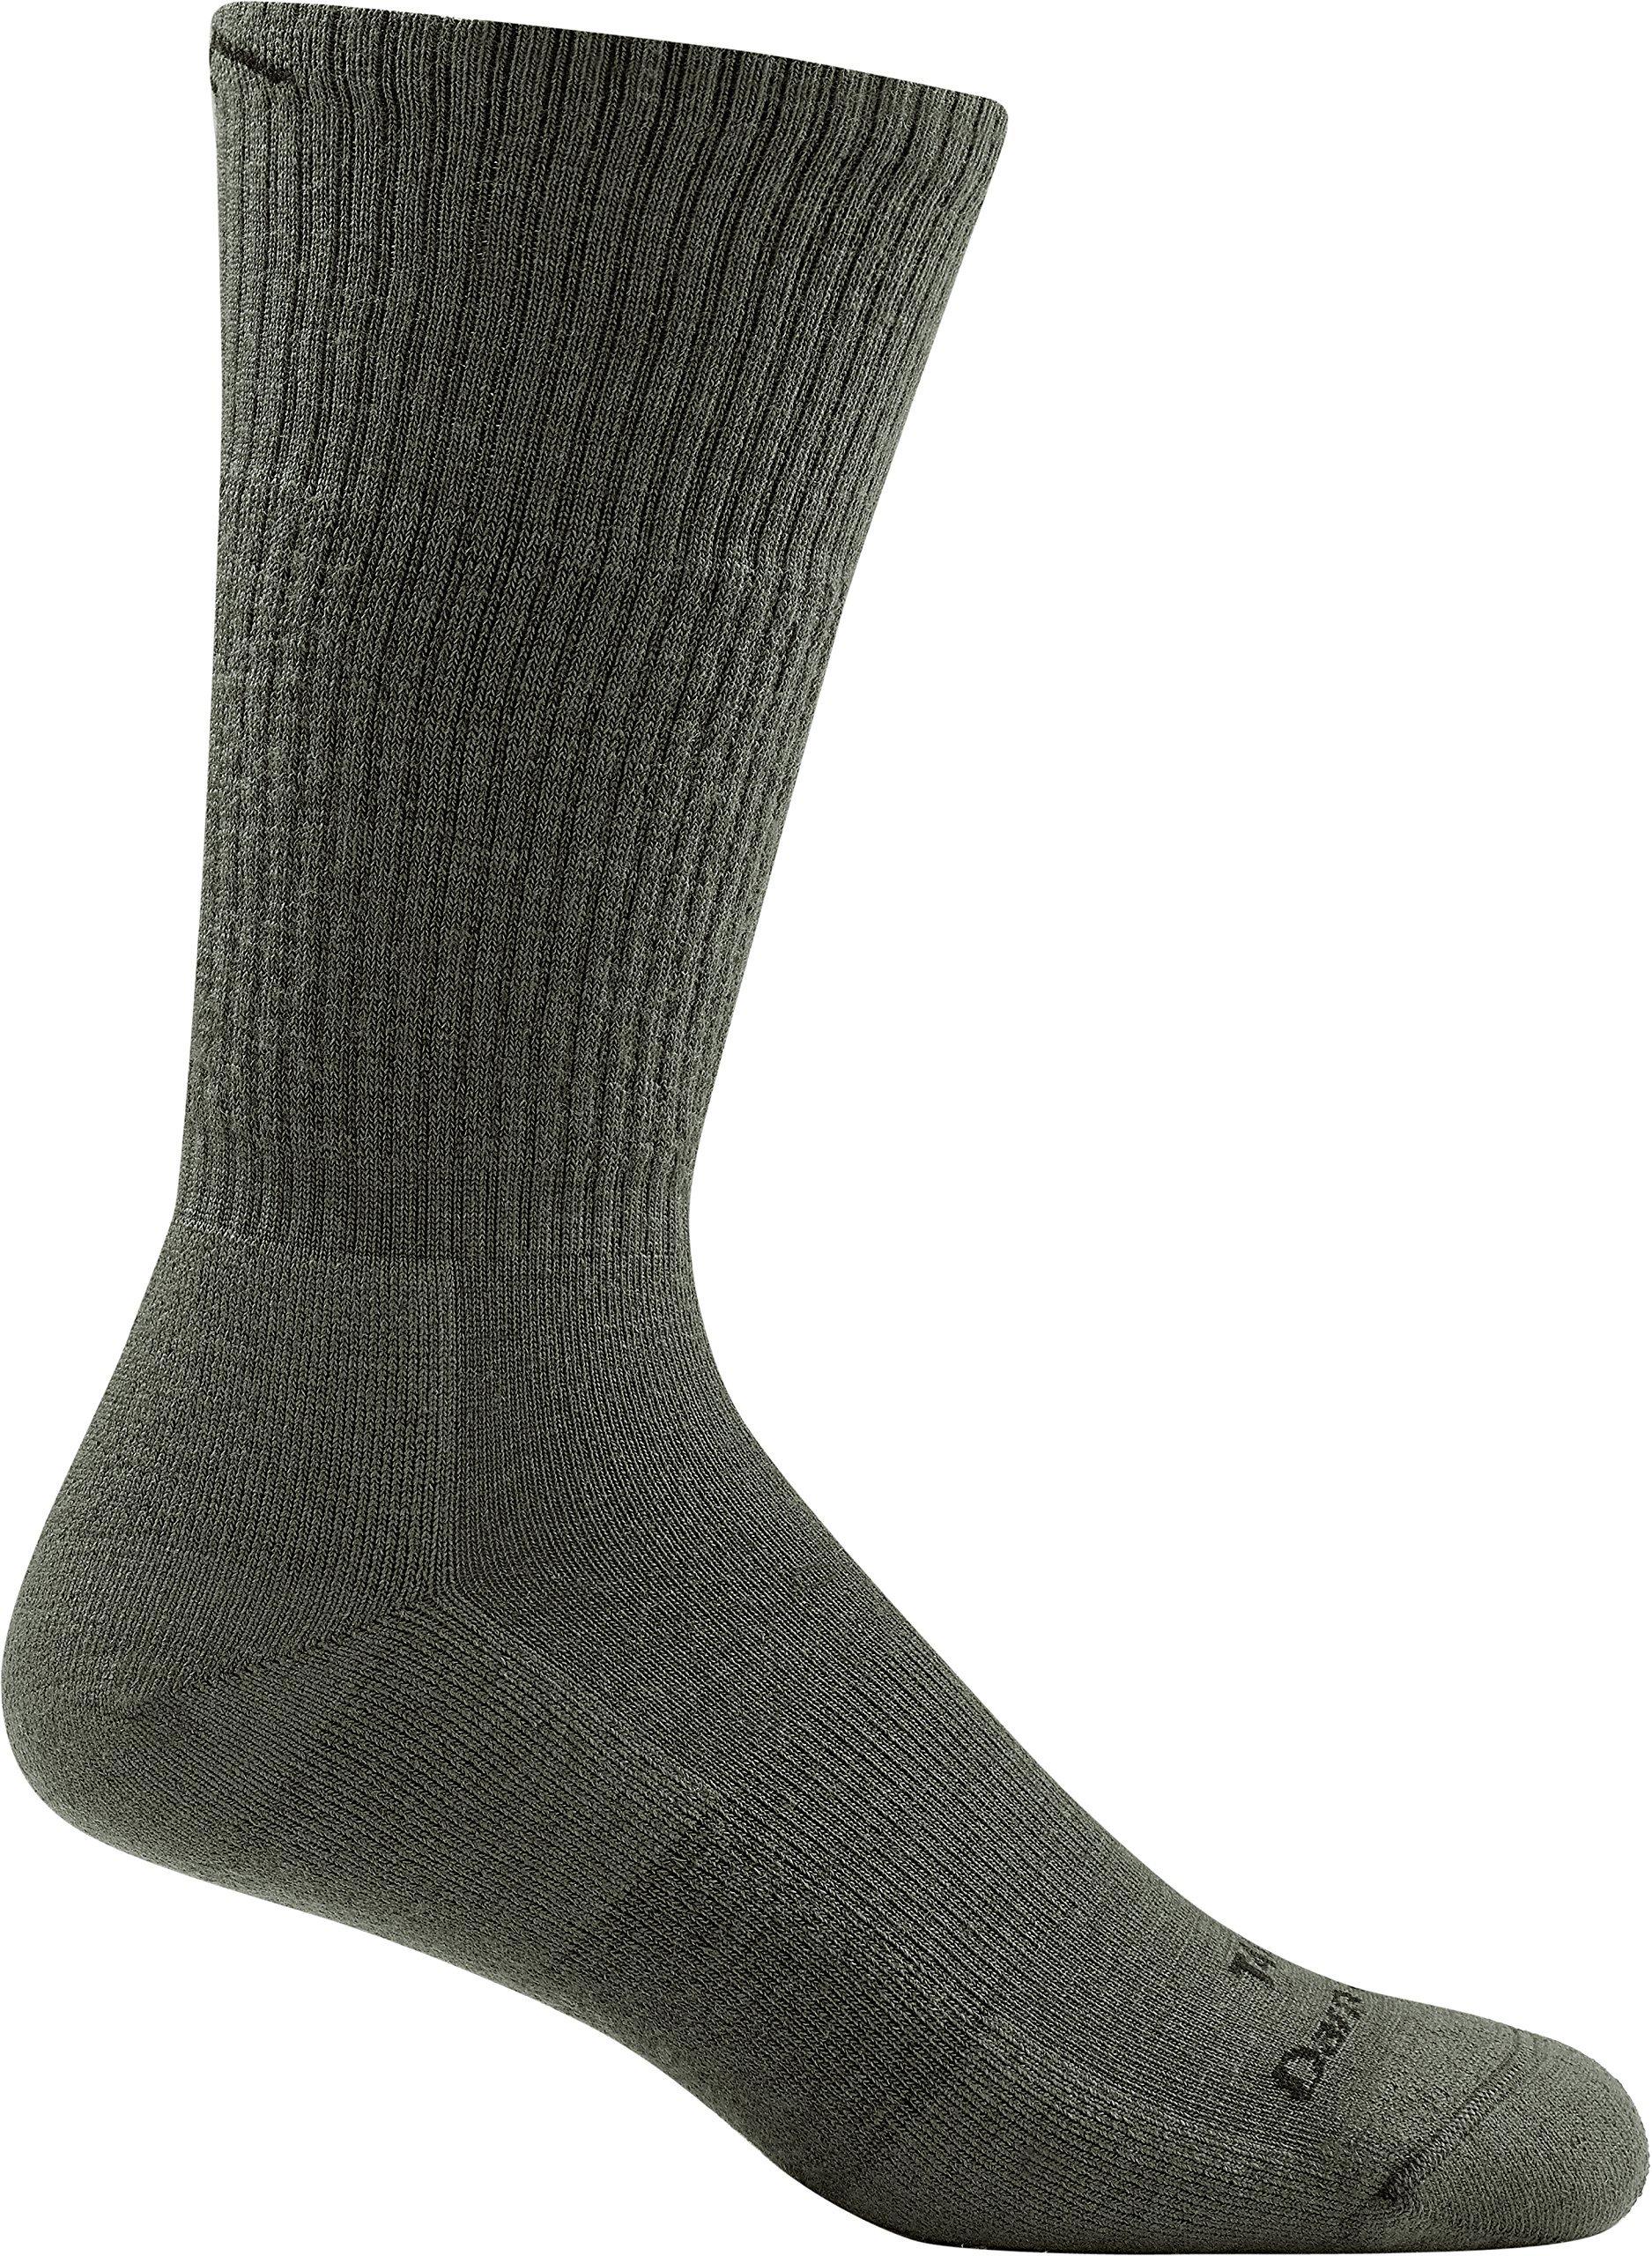 Darn Tough Tactical Boot Cushion Sock – Foliage Green X-Large